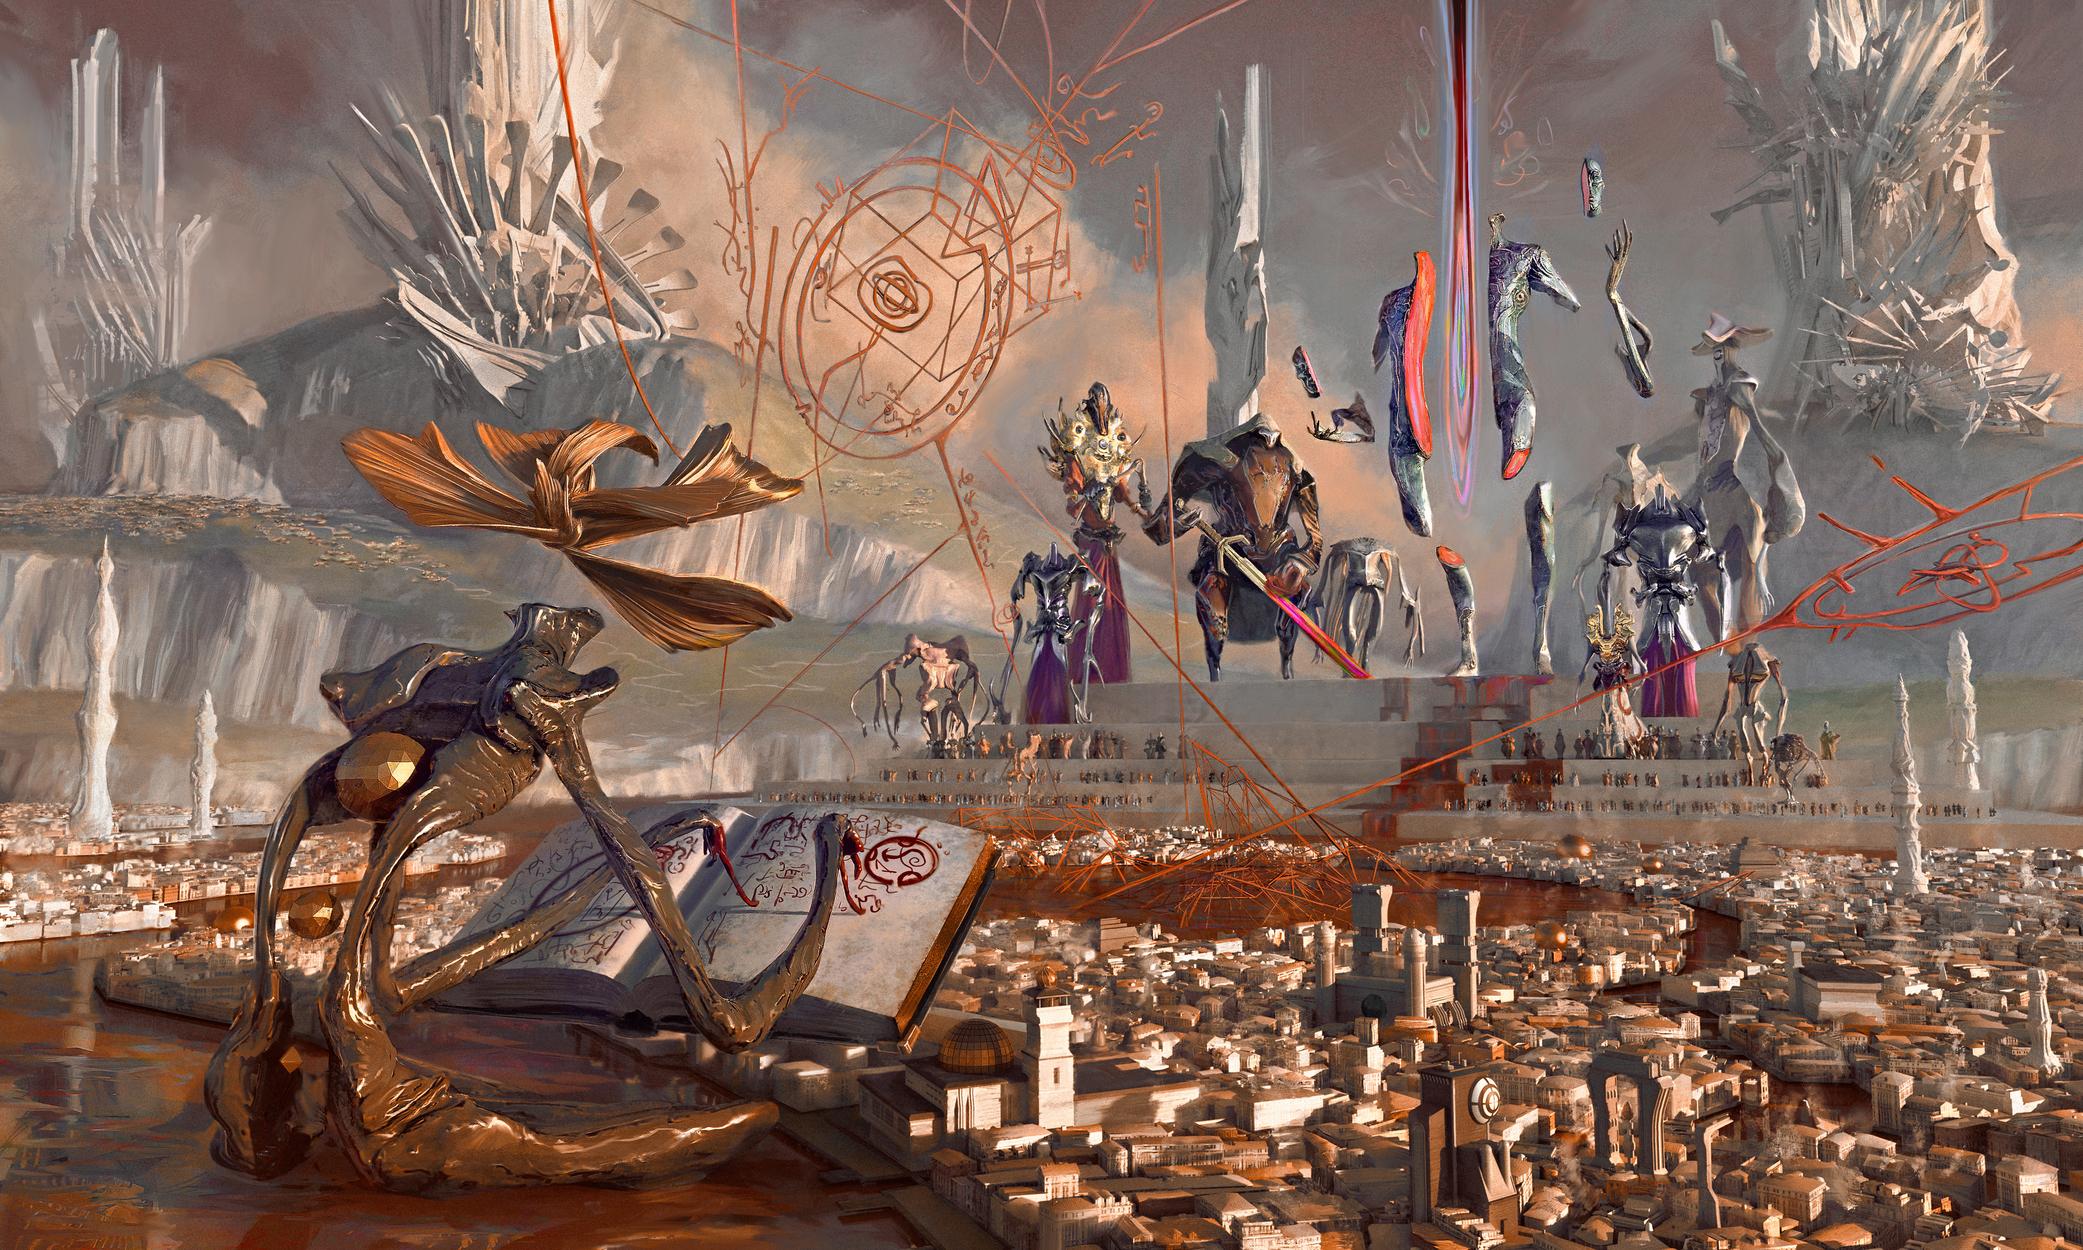 Runes Artwork by Aldo Katayanagi